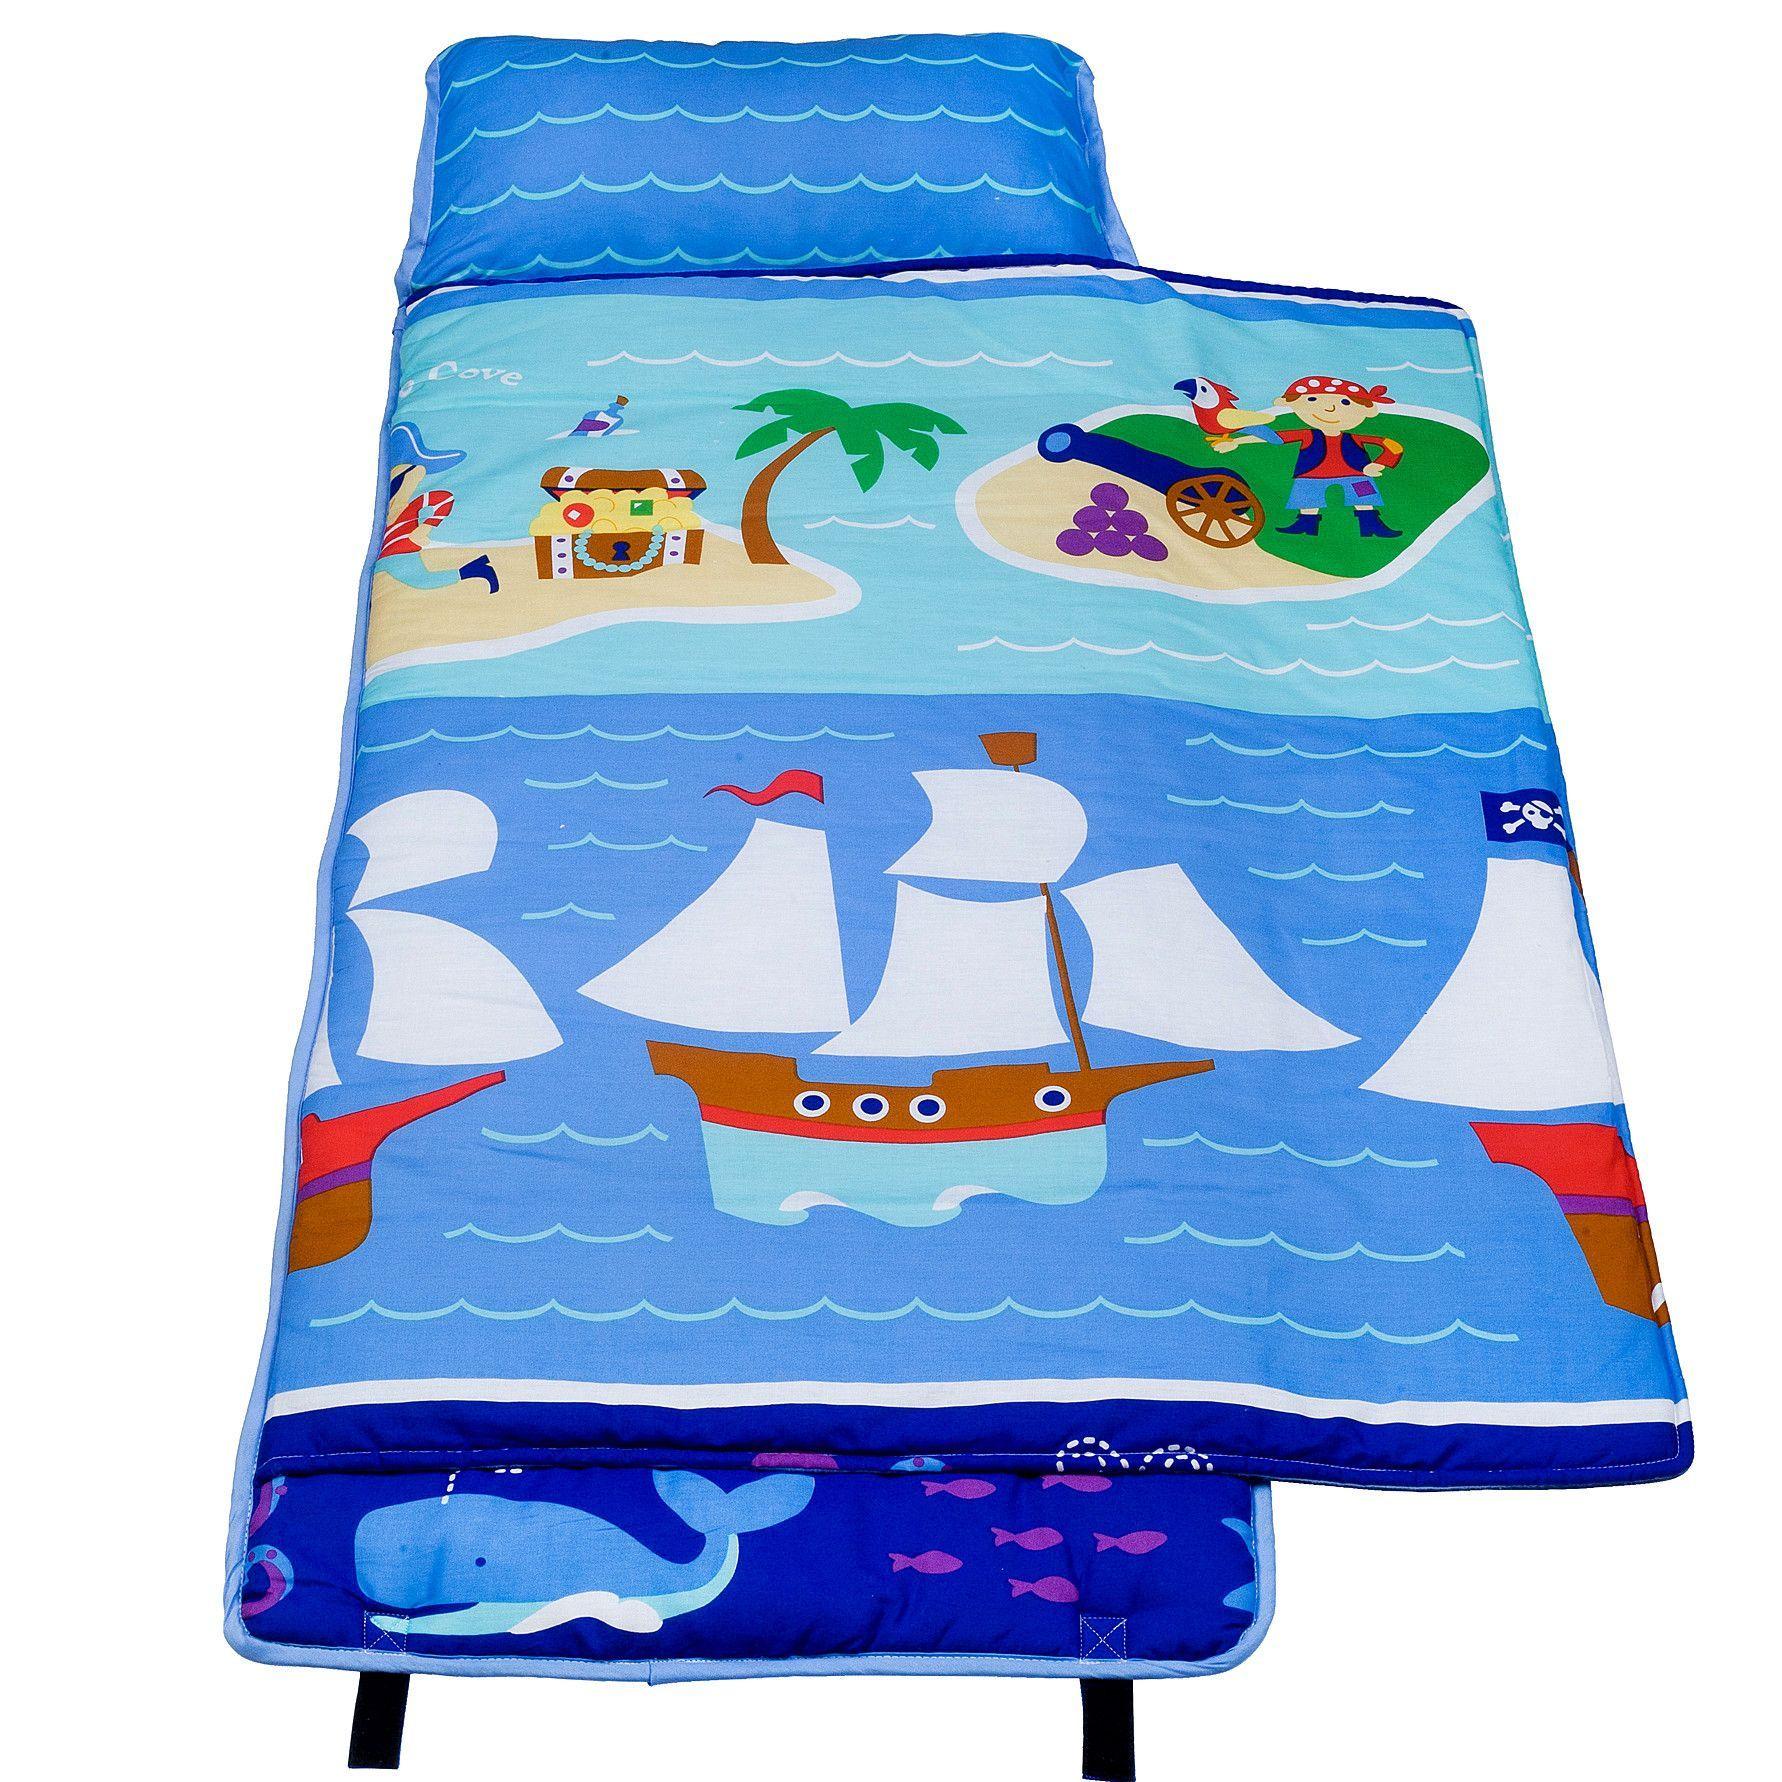 "Pirates 1.5"" Thick Folding Nap Mat Kids nap mats, Kids"